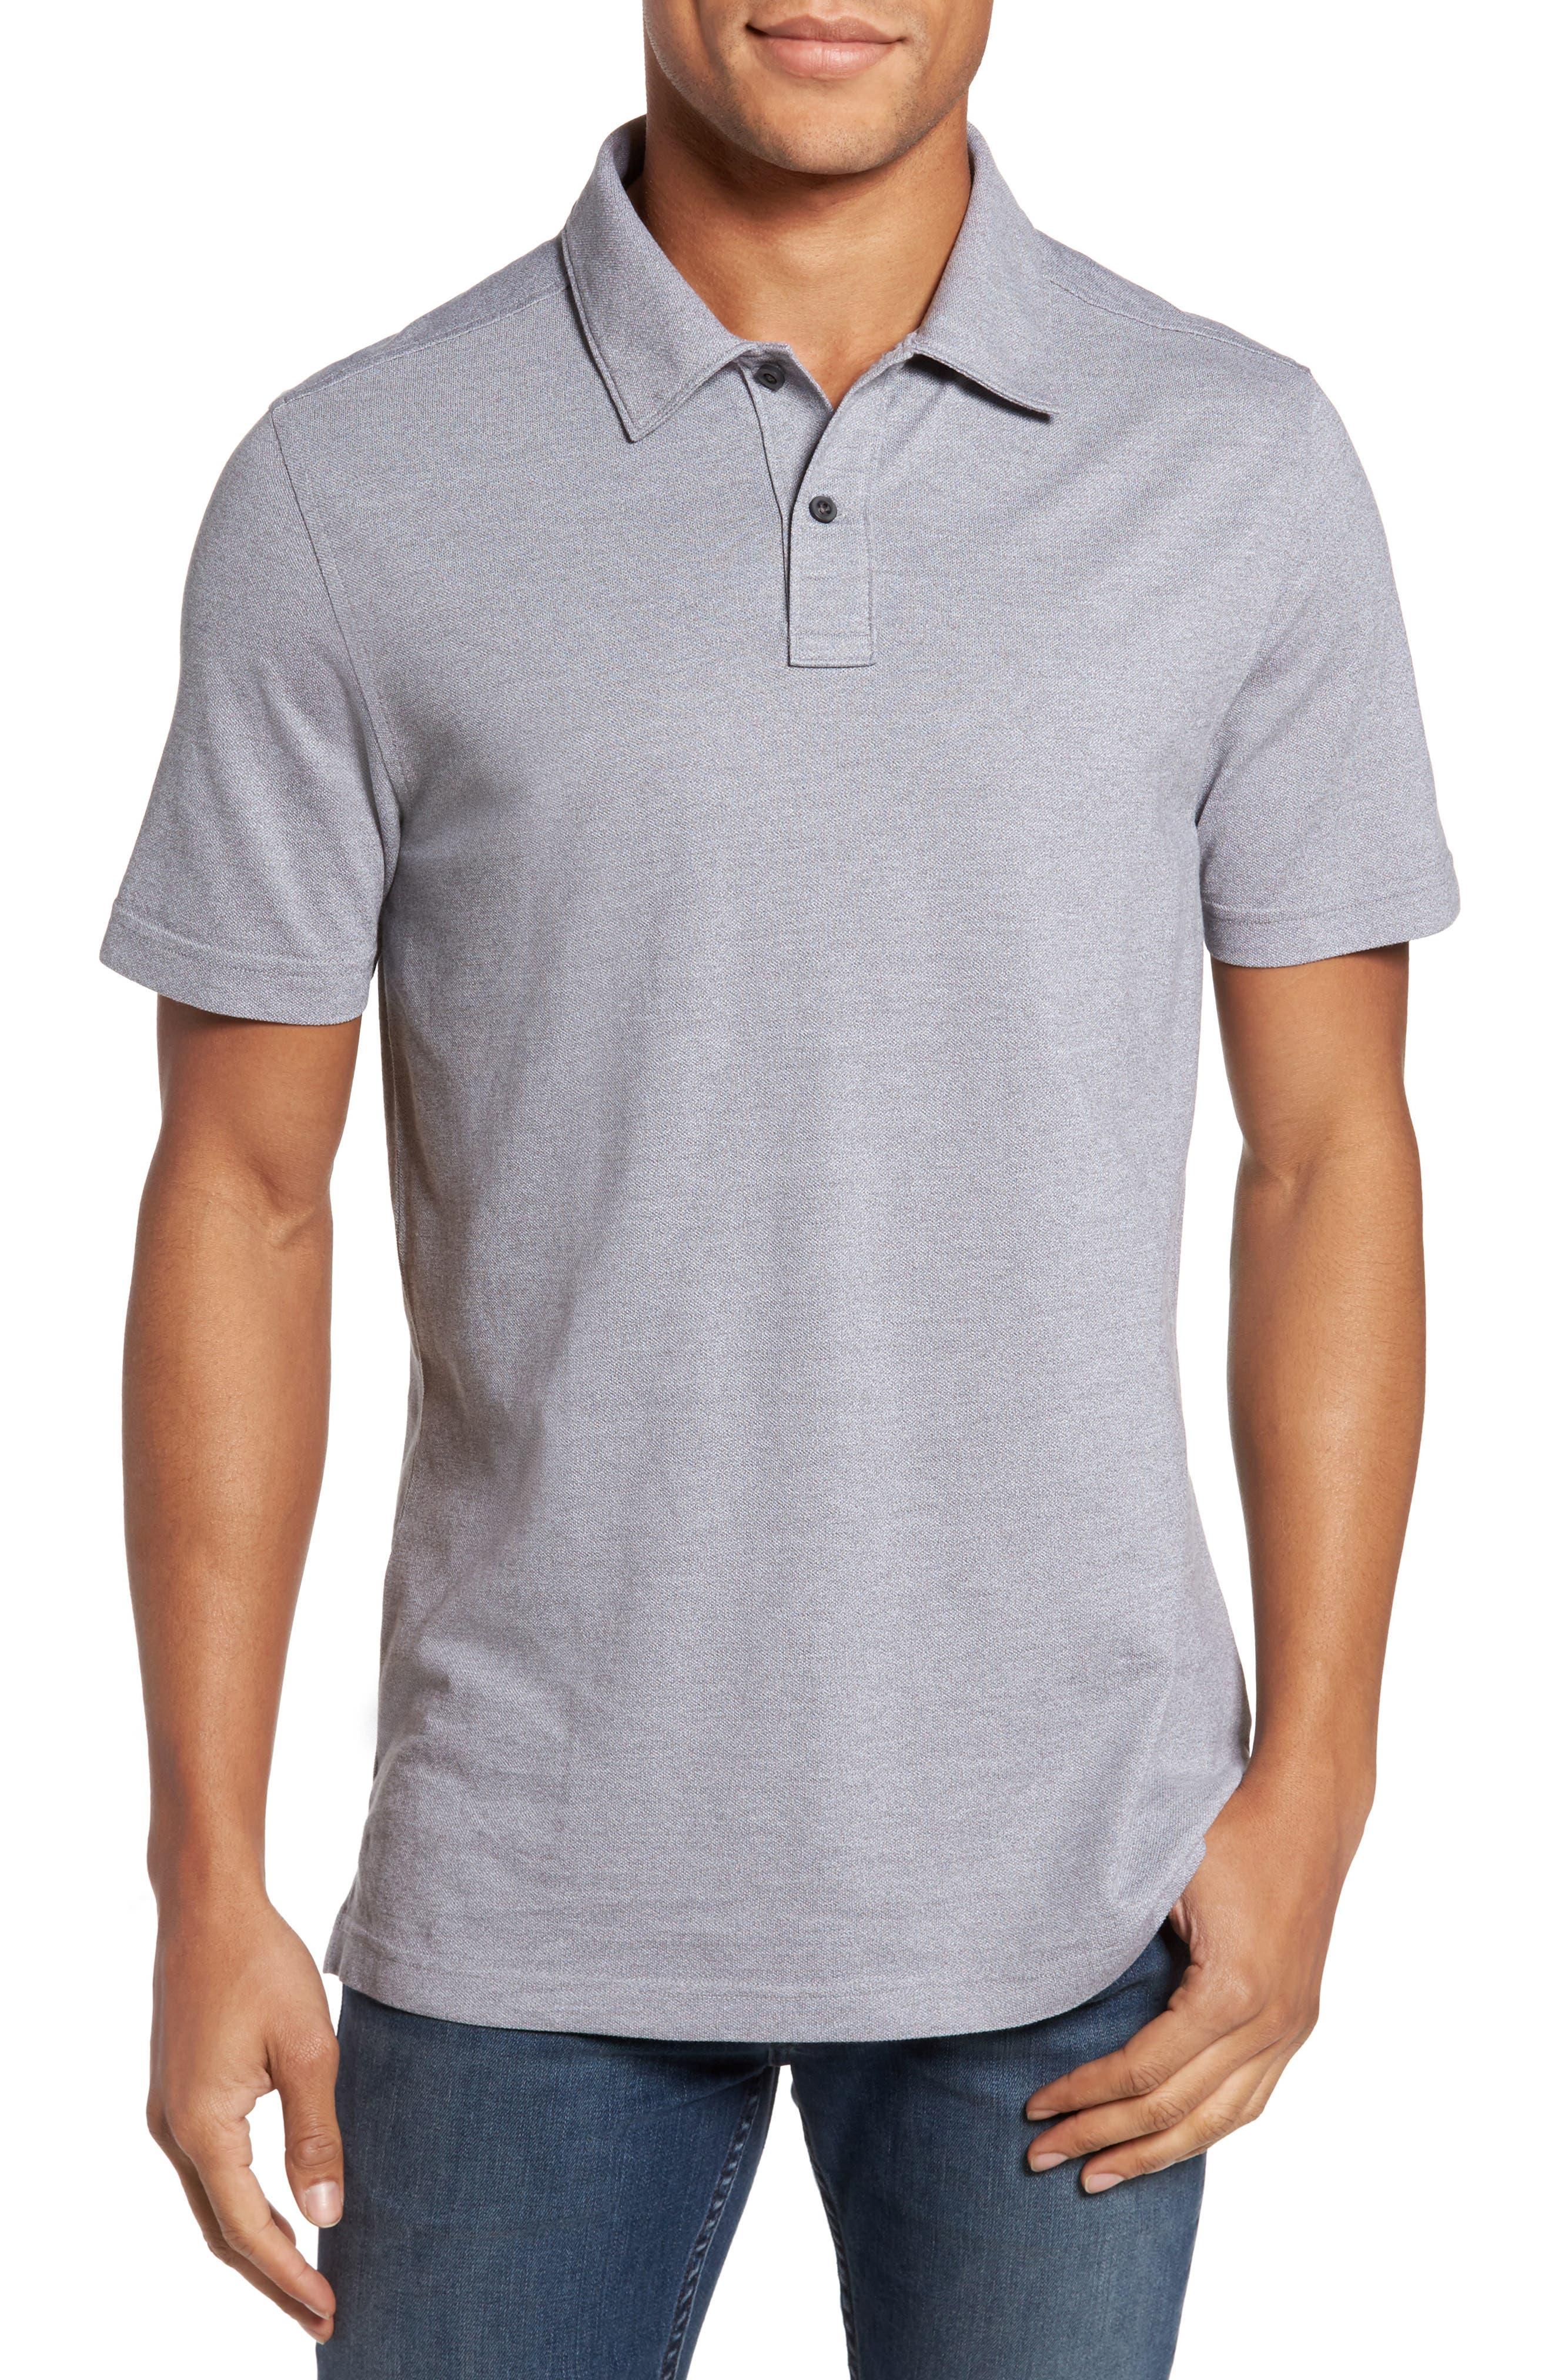 Main Image - Nordstrom Men's Shop Regular Fit Polo